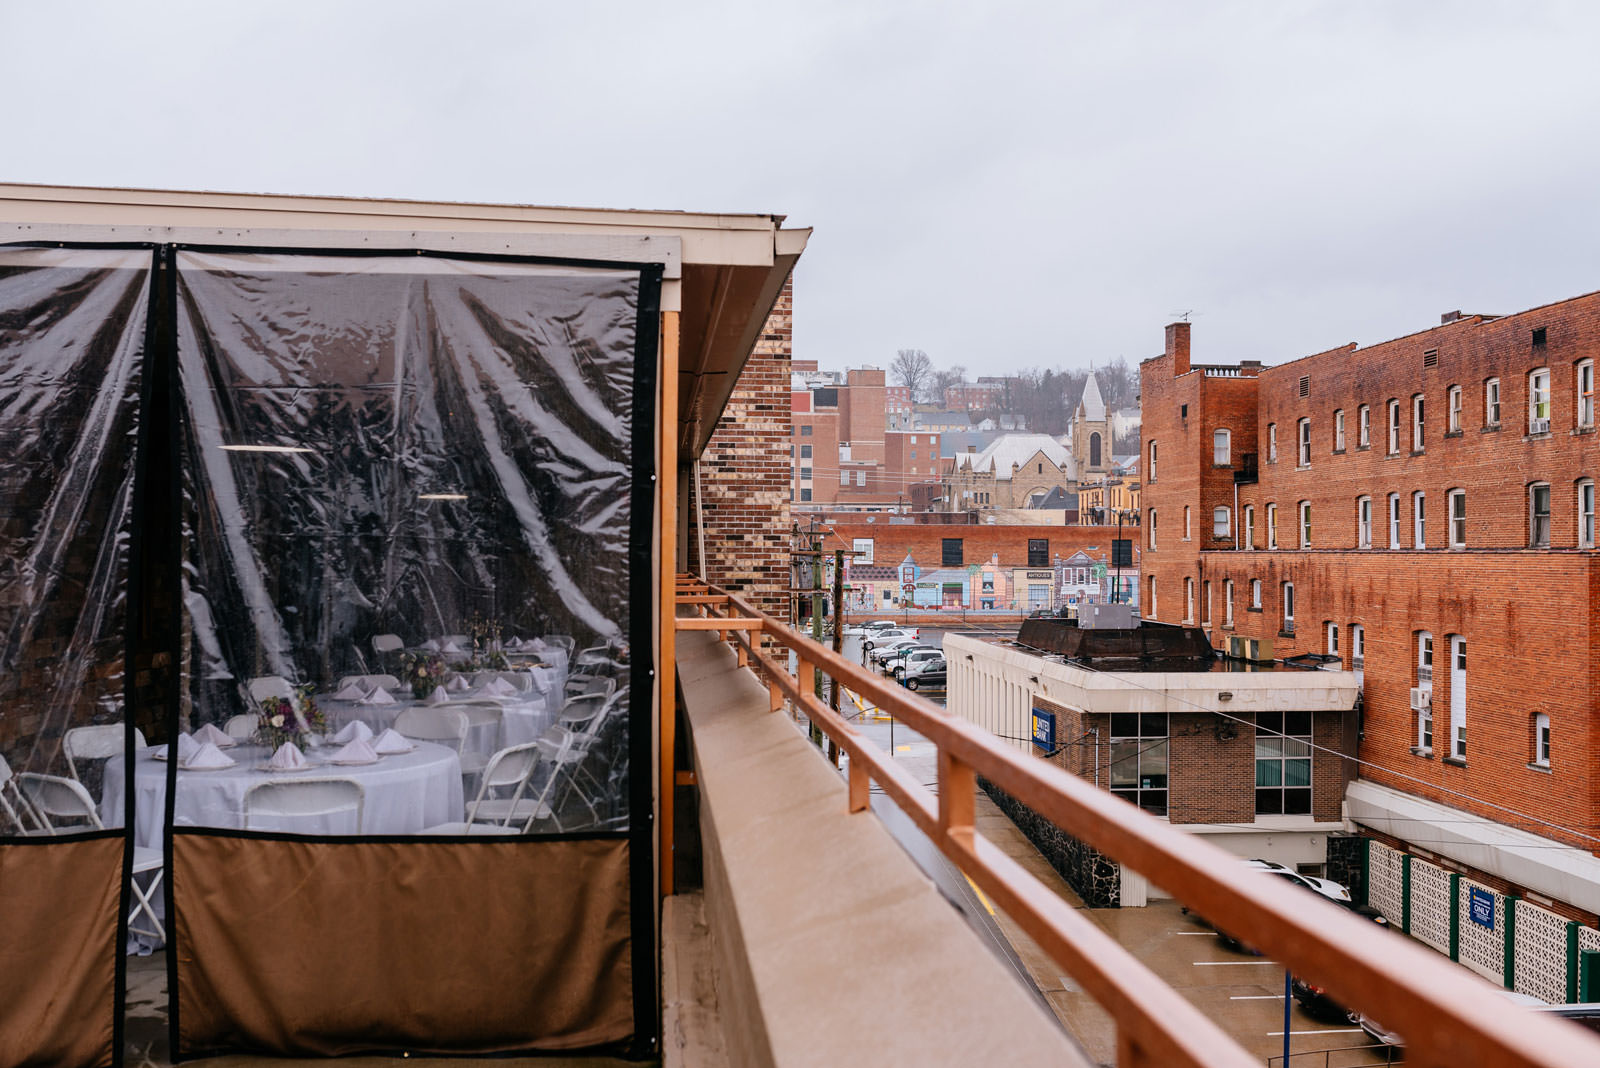 chestnut hotel rooftop